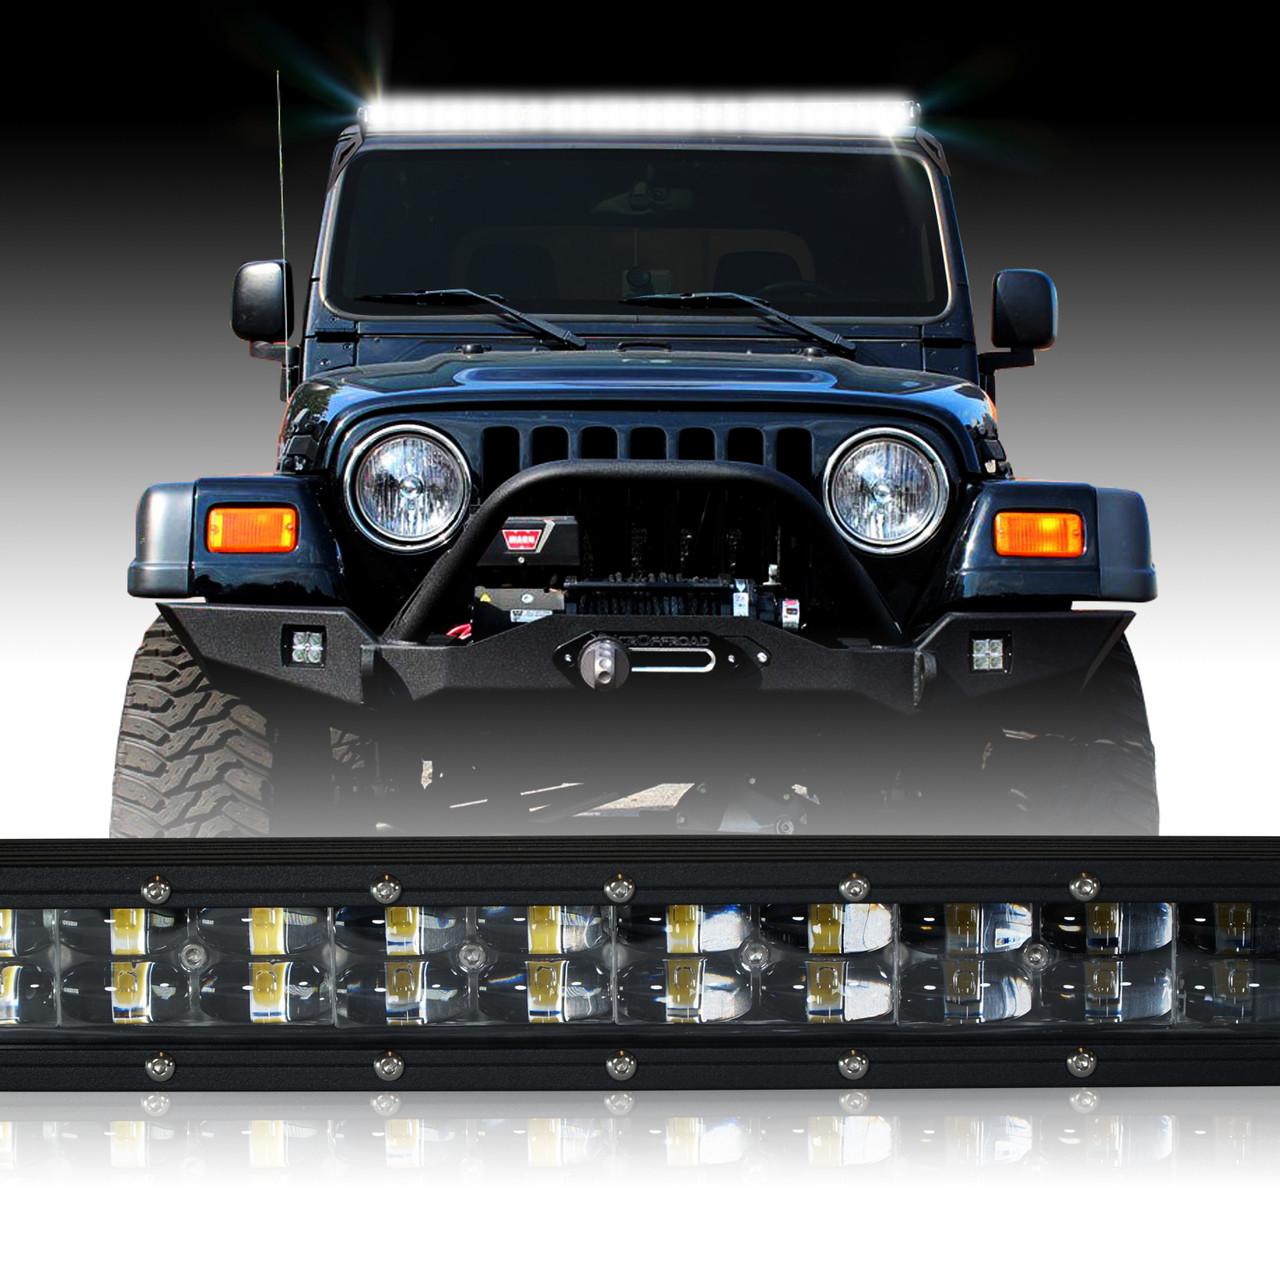 hight resolution of 2006 jeep wrangler wiring harness wiring diagram 1999 jeep wrangler heater wiring harness 2000 jeep wrangler